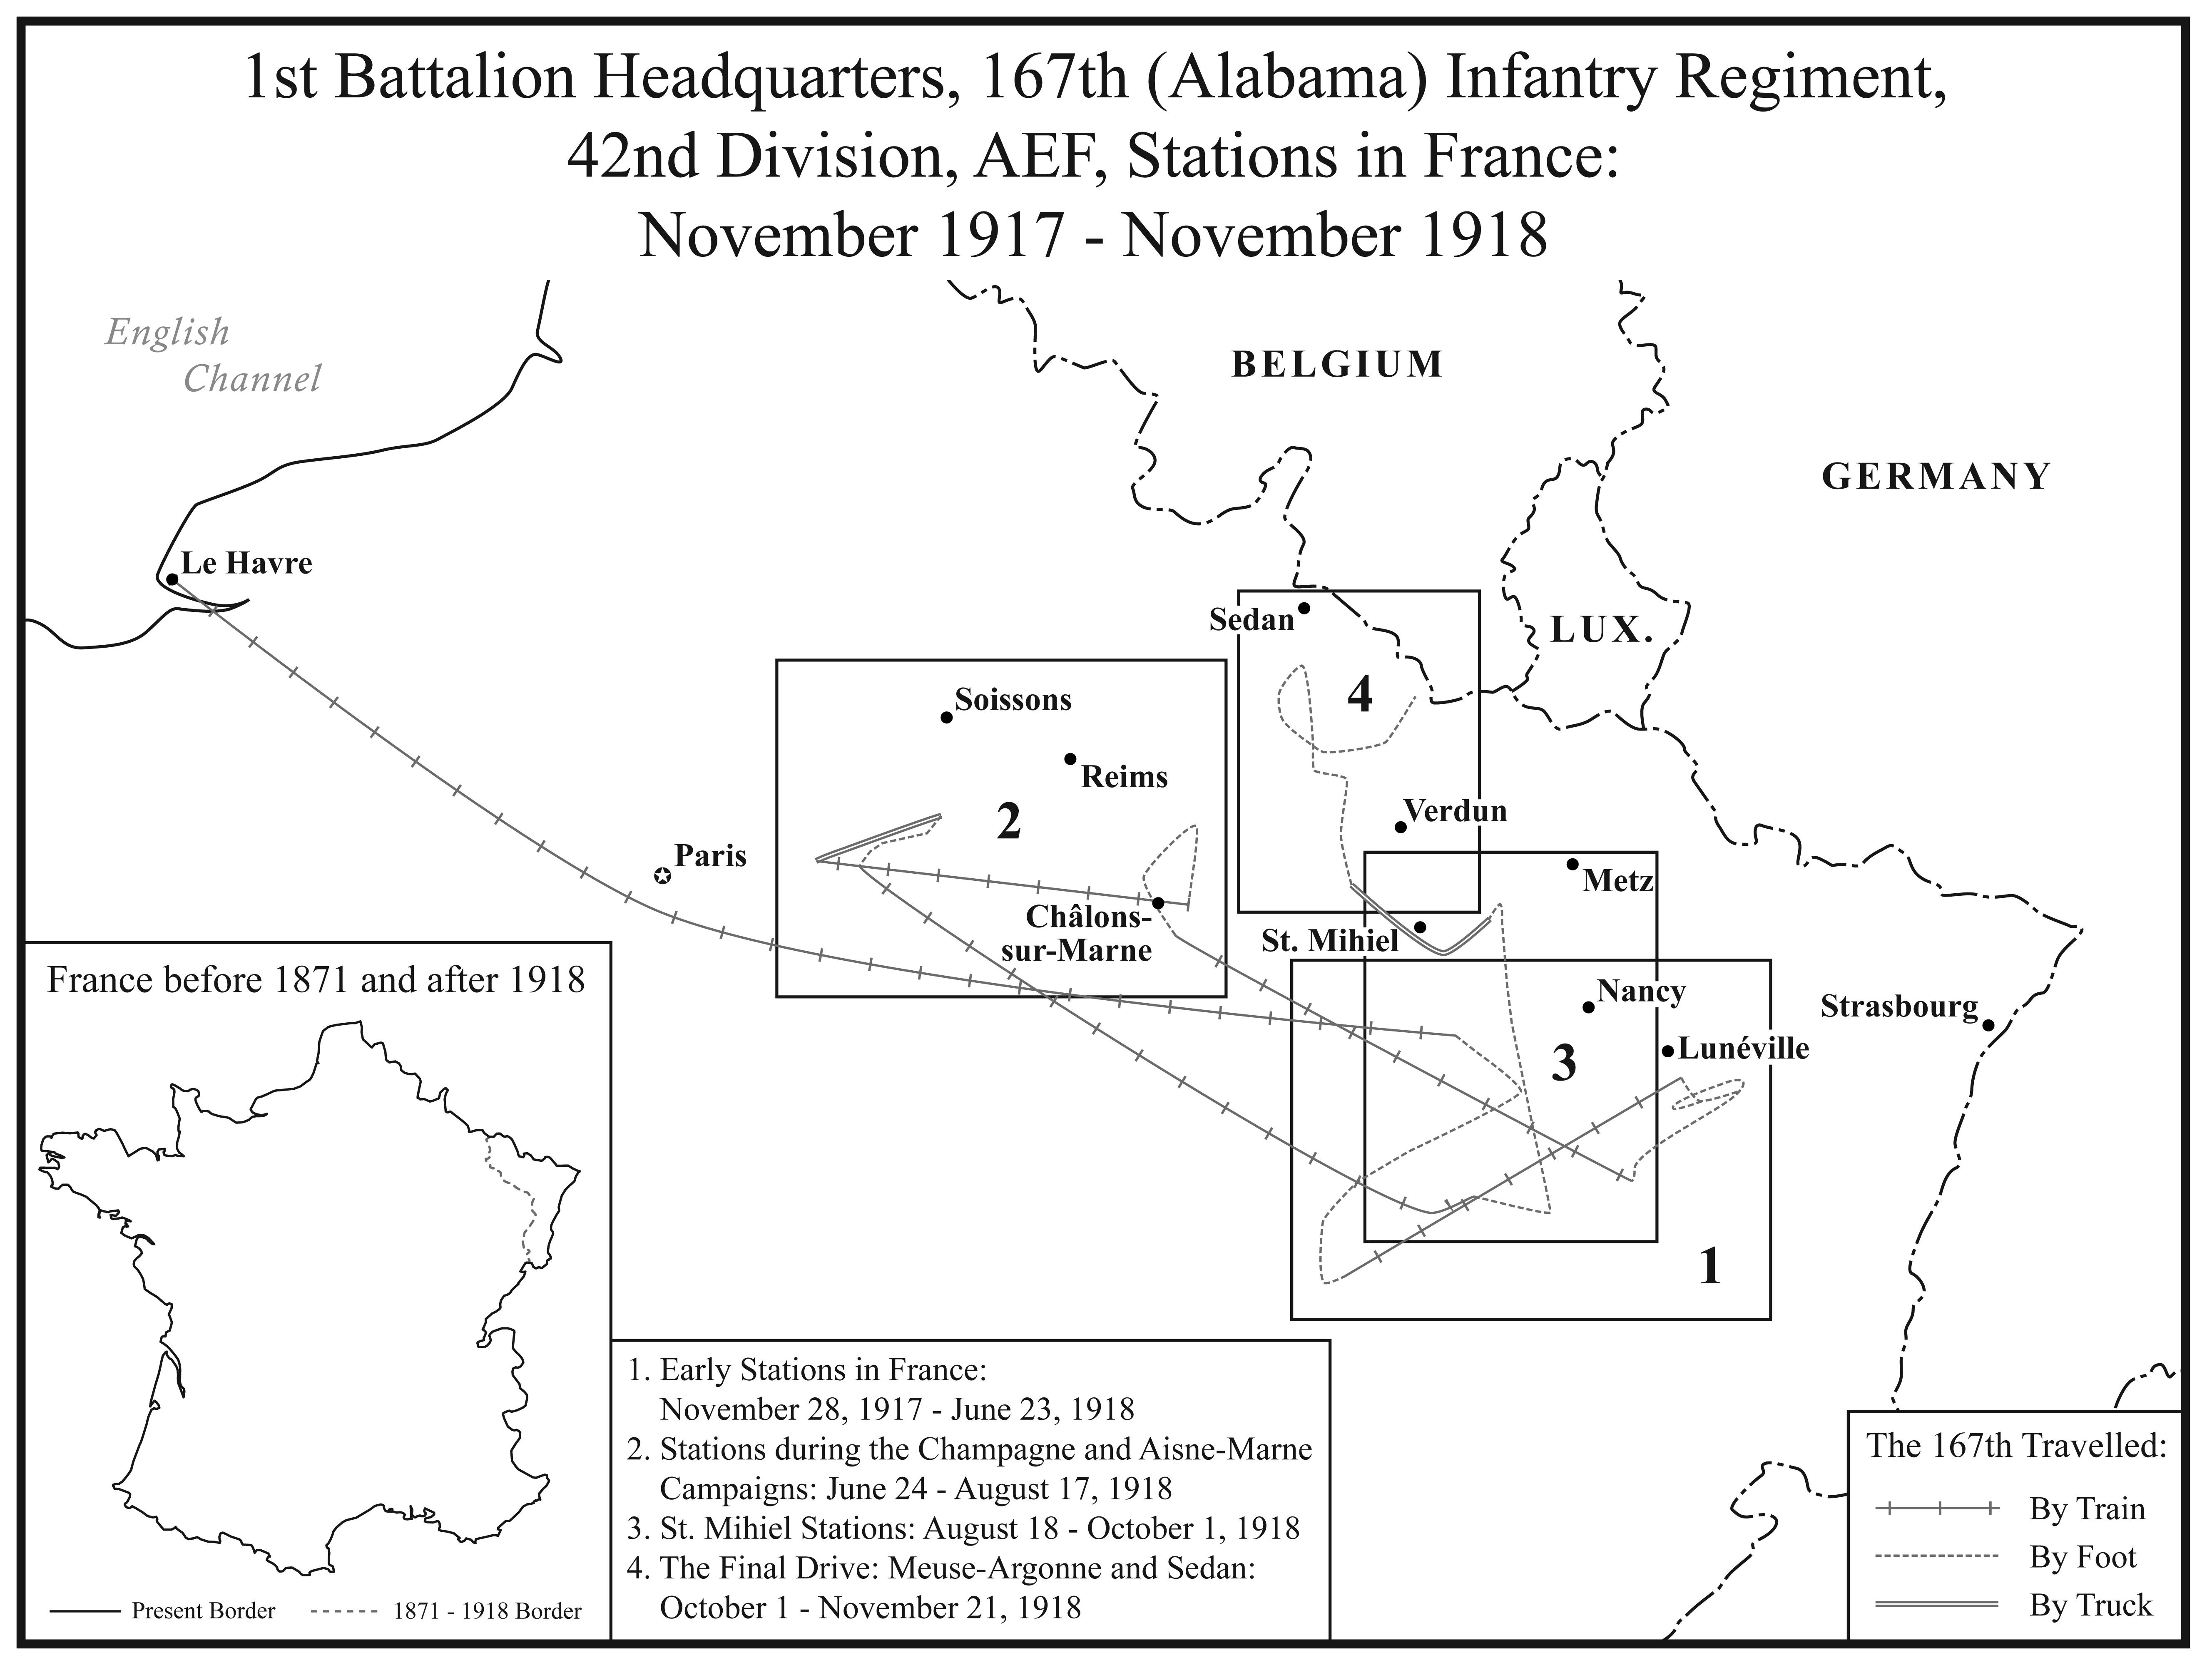 I. 1st Battalion Headquarters, 167th Alabama Regiment Stations in France.